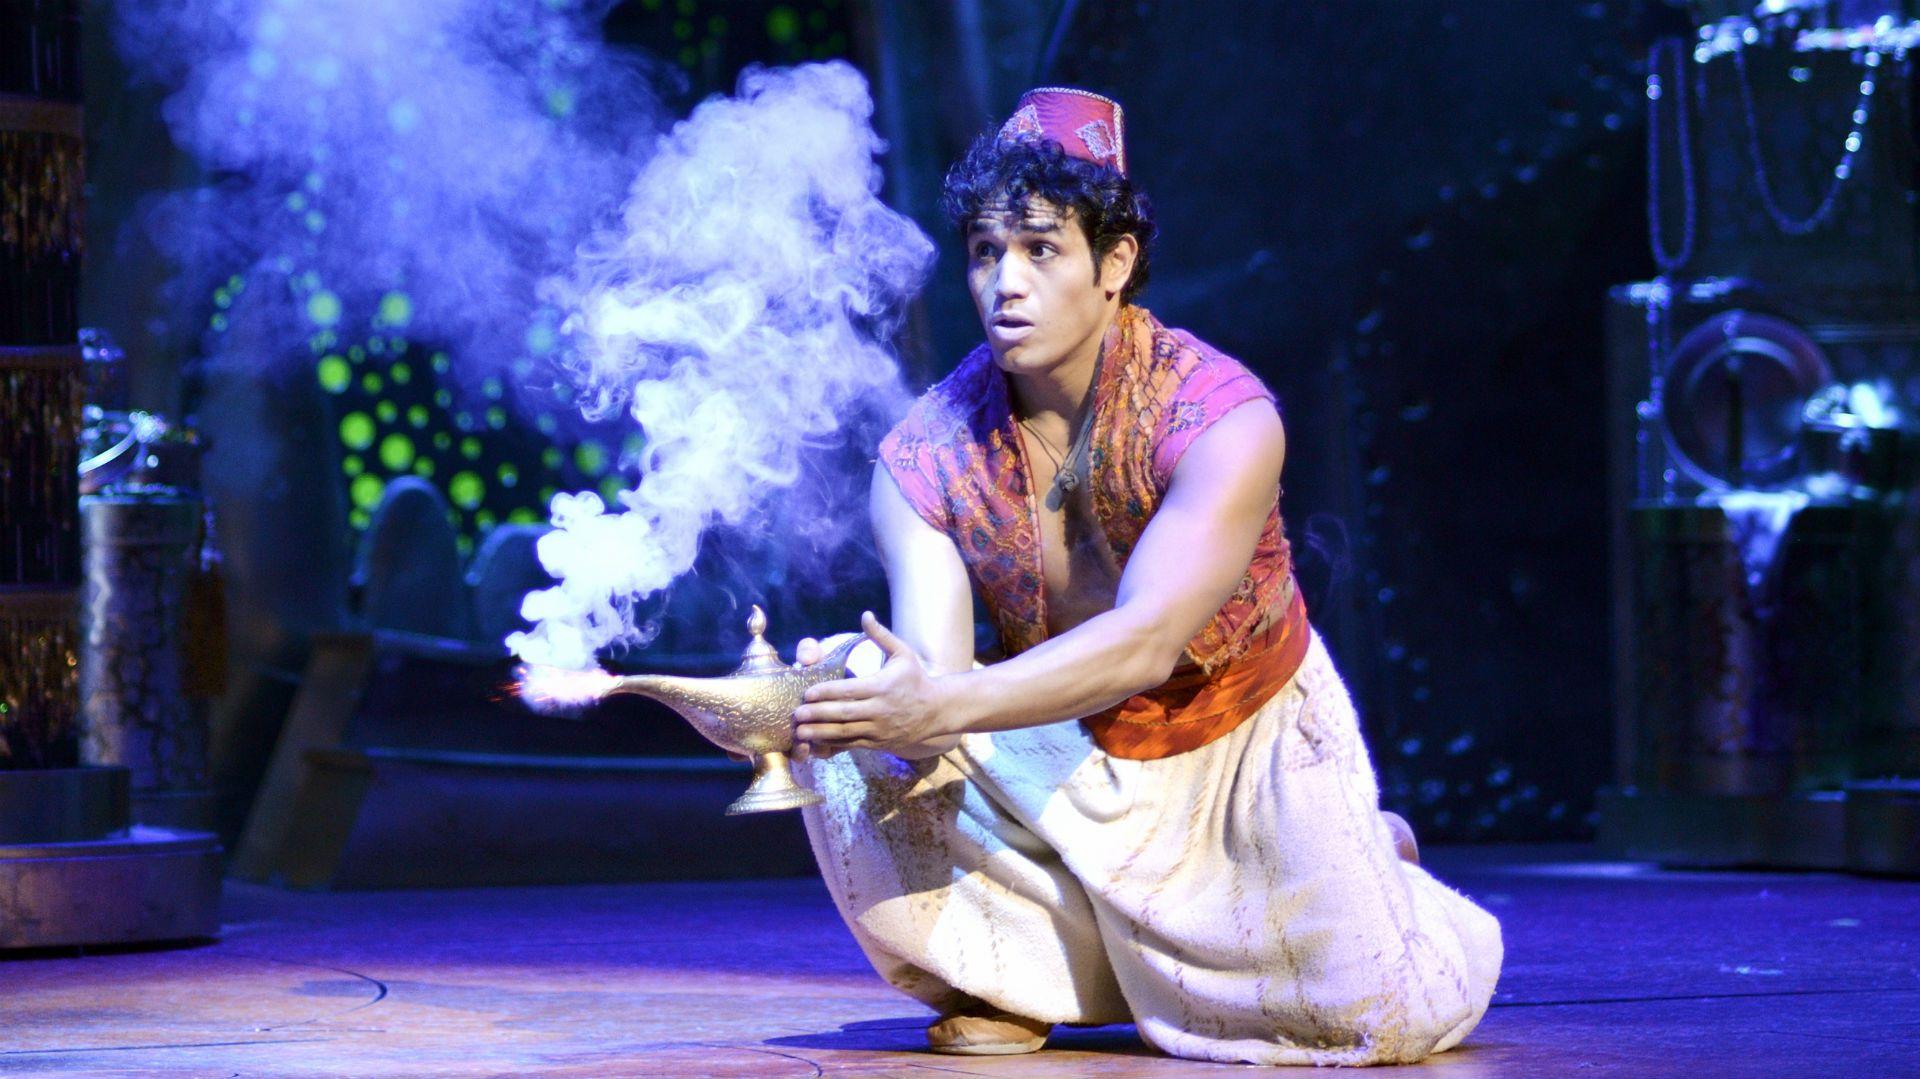 Broadway review udisney aladdinu broadway and movie